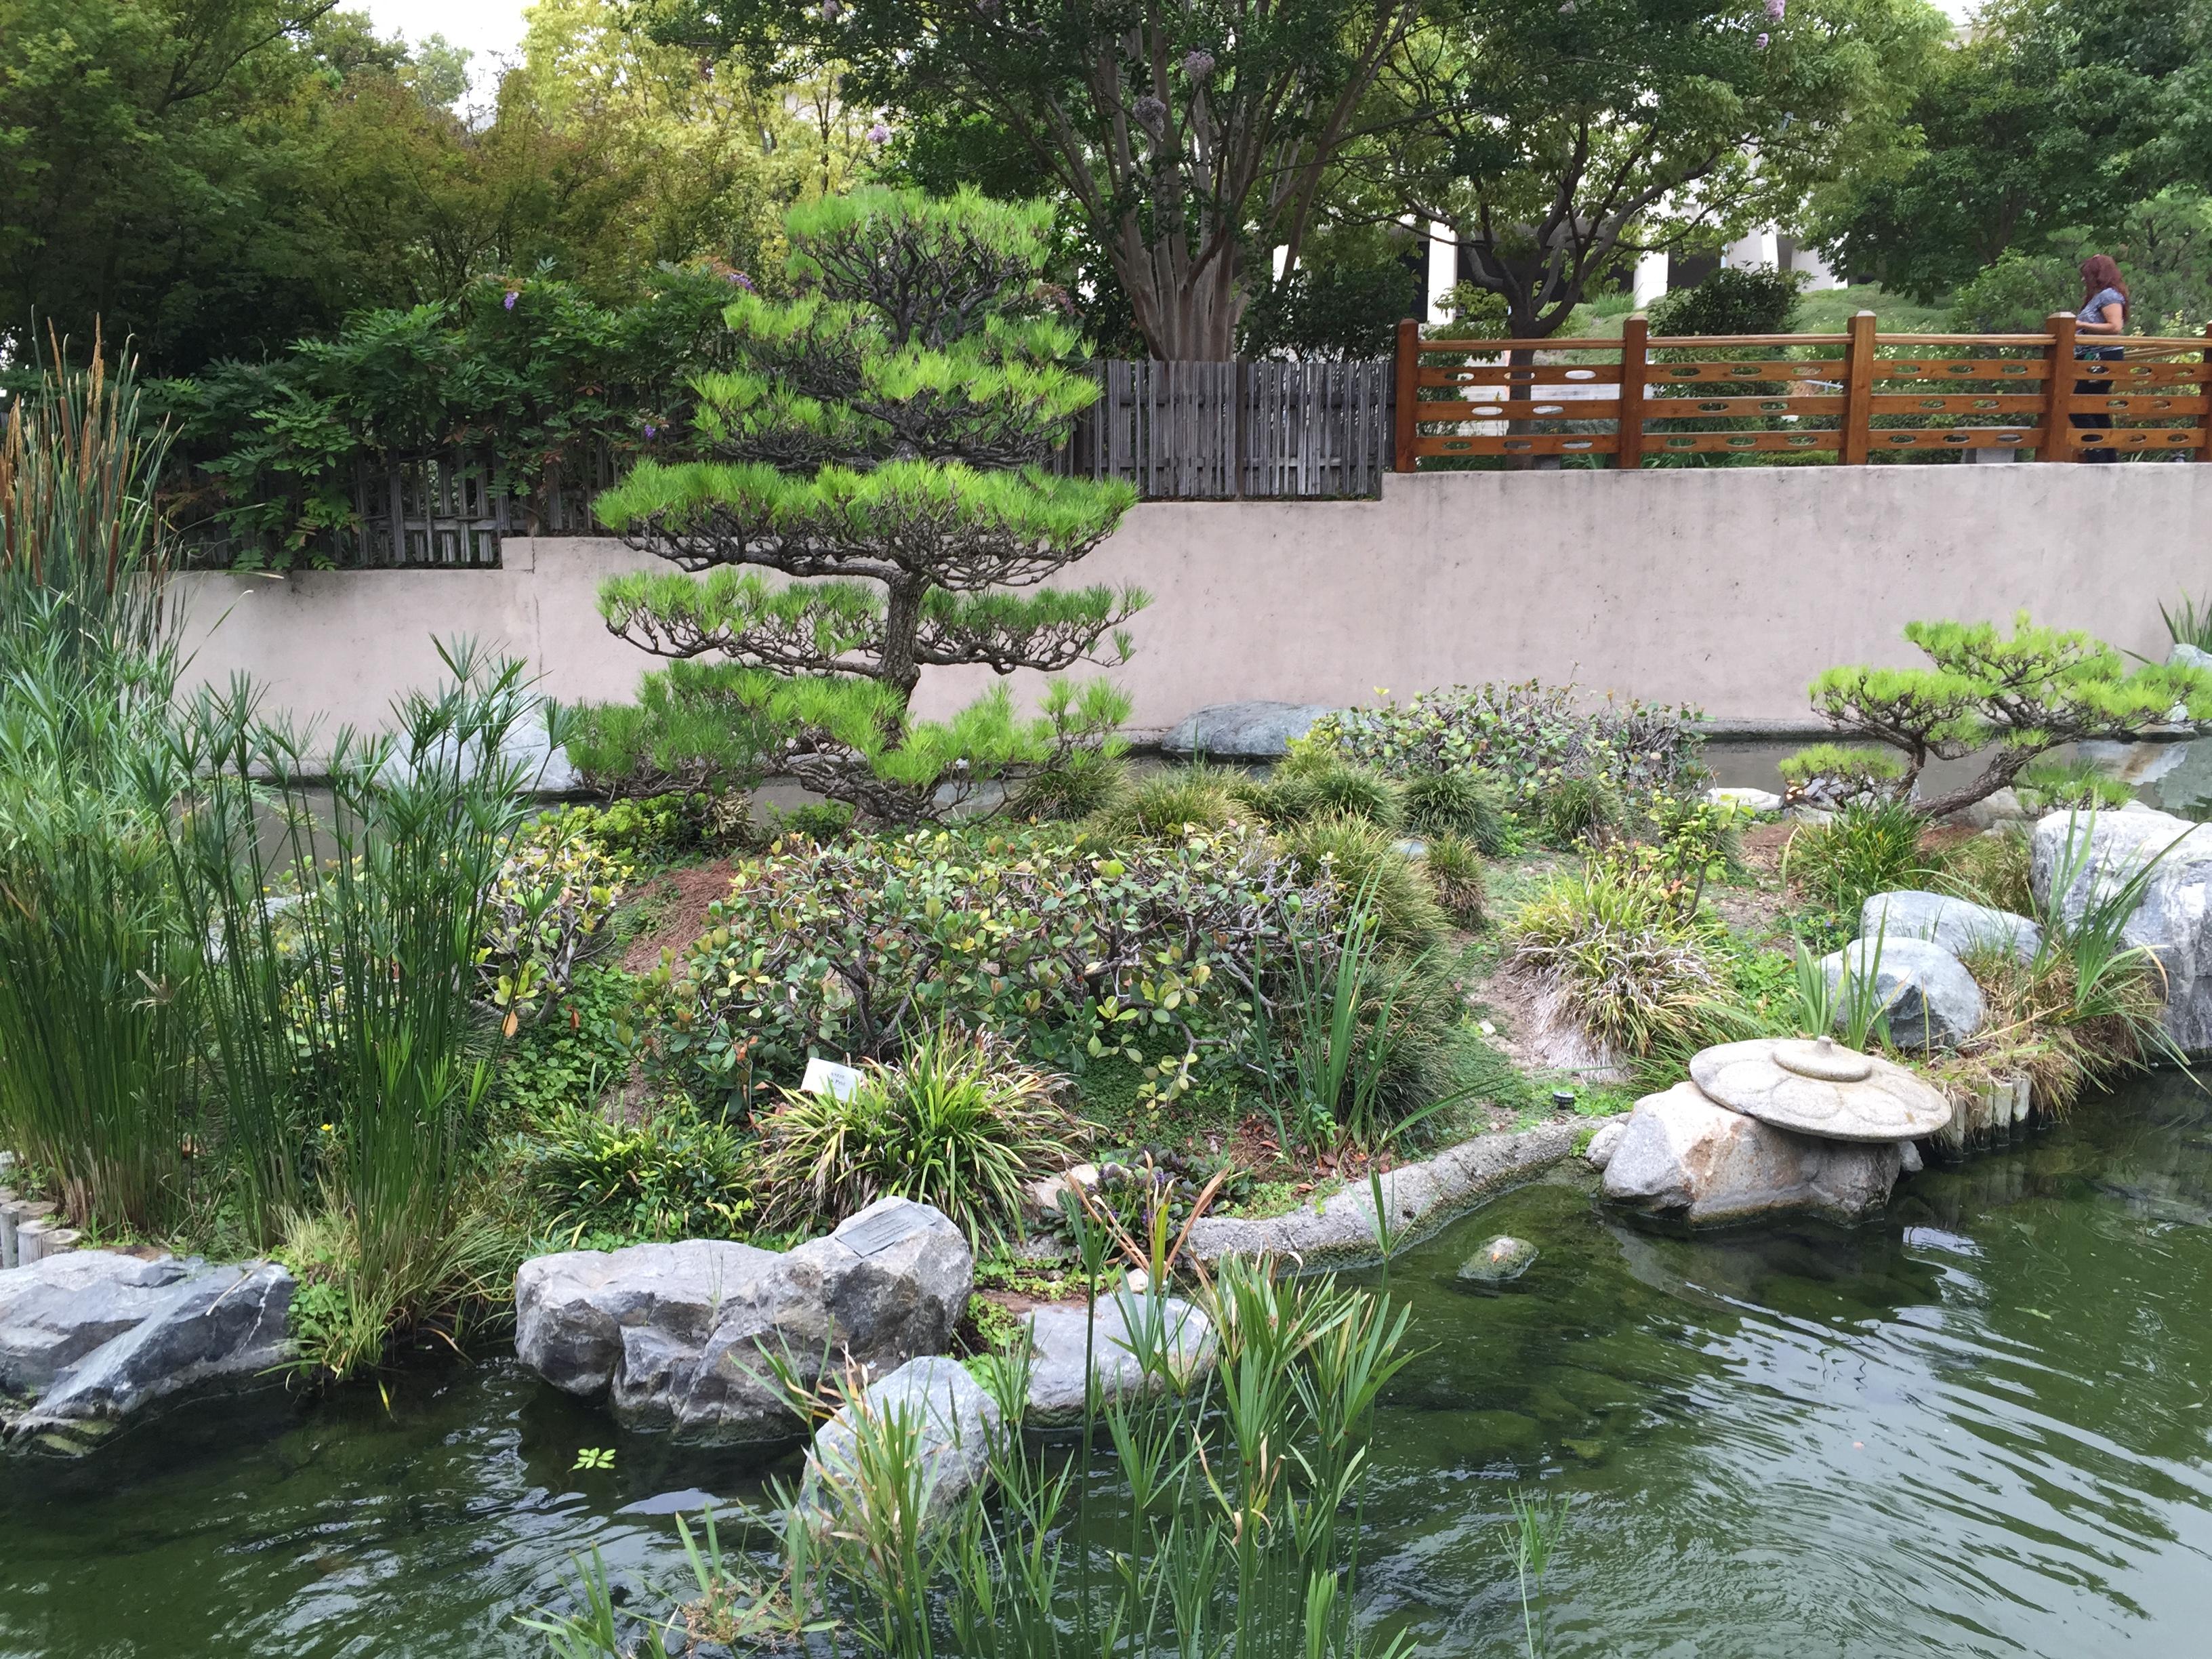 Japanese Garden Cal Poly Pomona Bonsai Club Los Angeles Trees Los Angeles Baikoen Bonsai